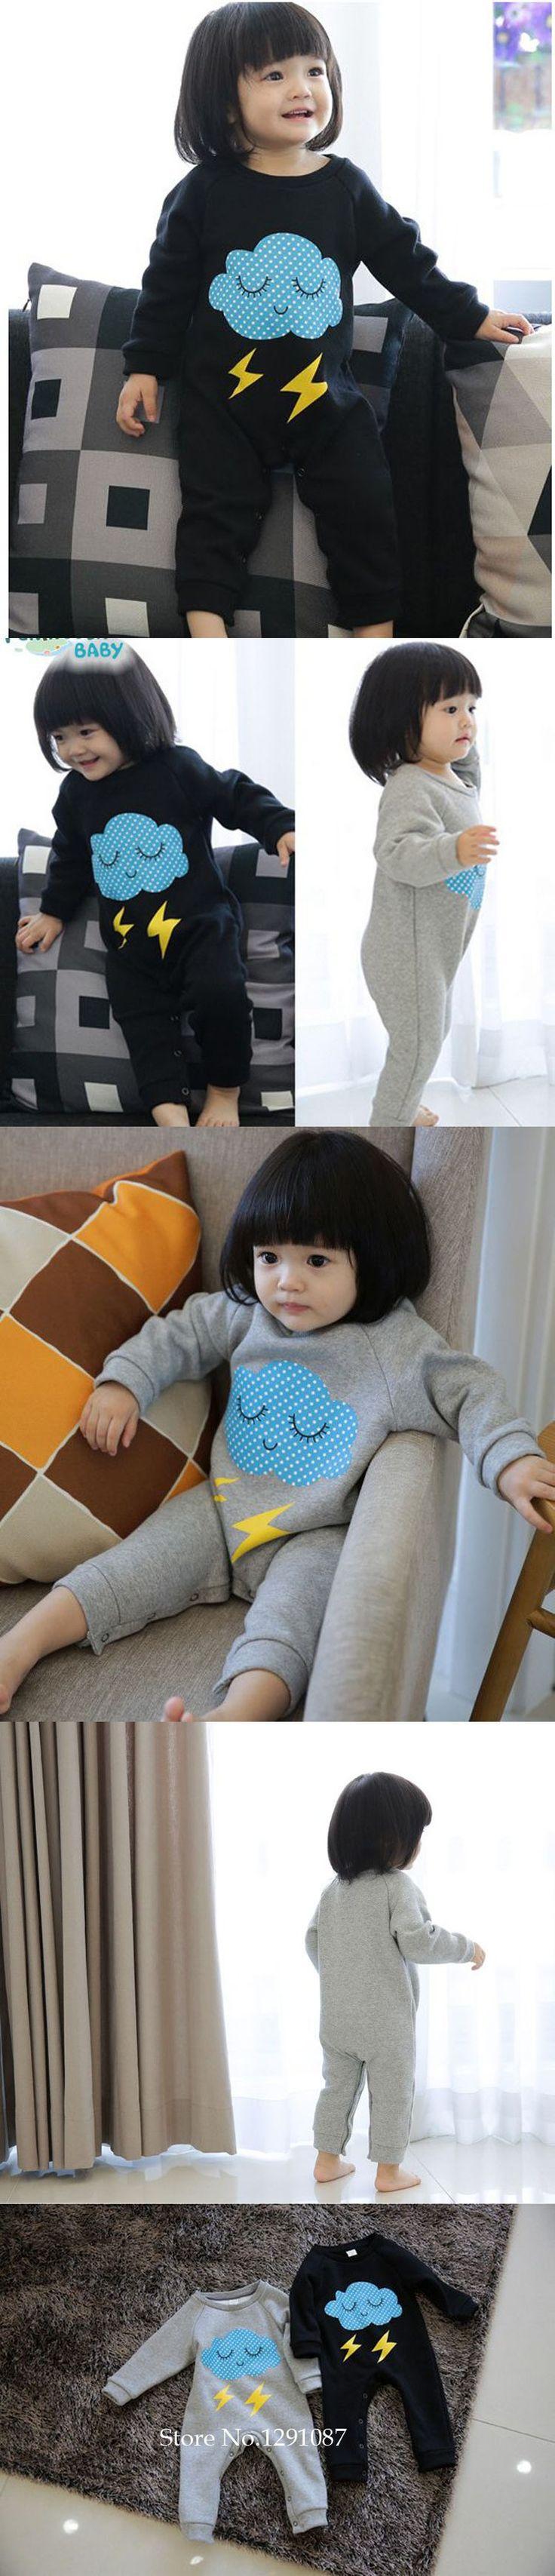 2016 New Spring Autumn Long-sleeved Baby Rompers Unisex Newborn Romper for Baby Infant Cotton Clothing Hot Roupa De Bebe Menino